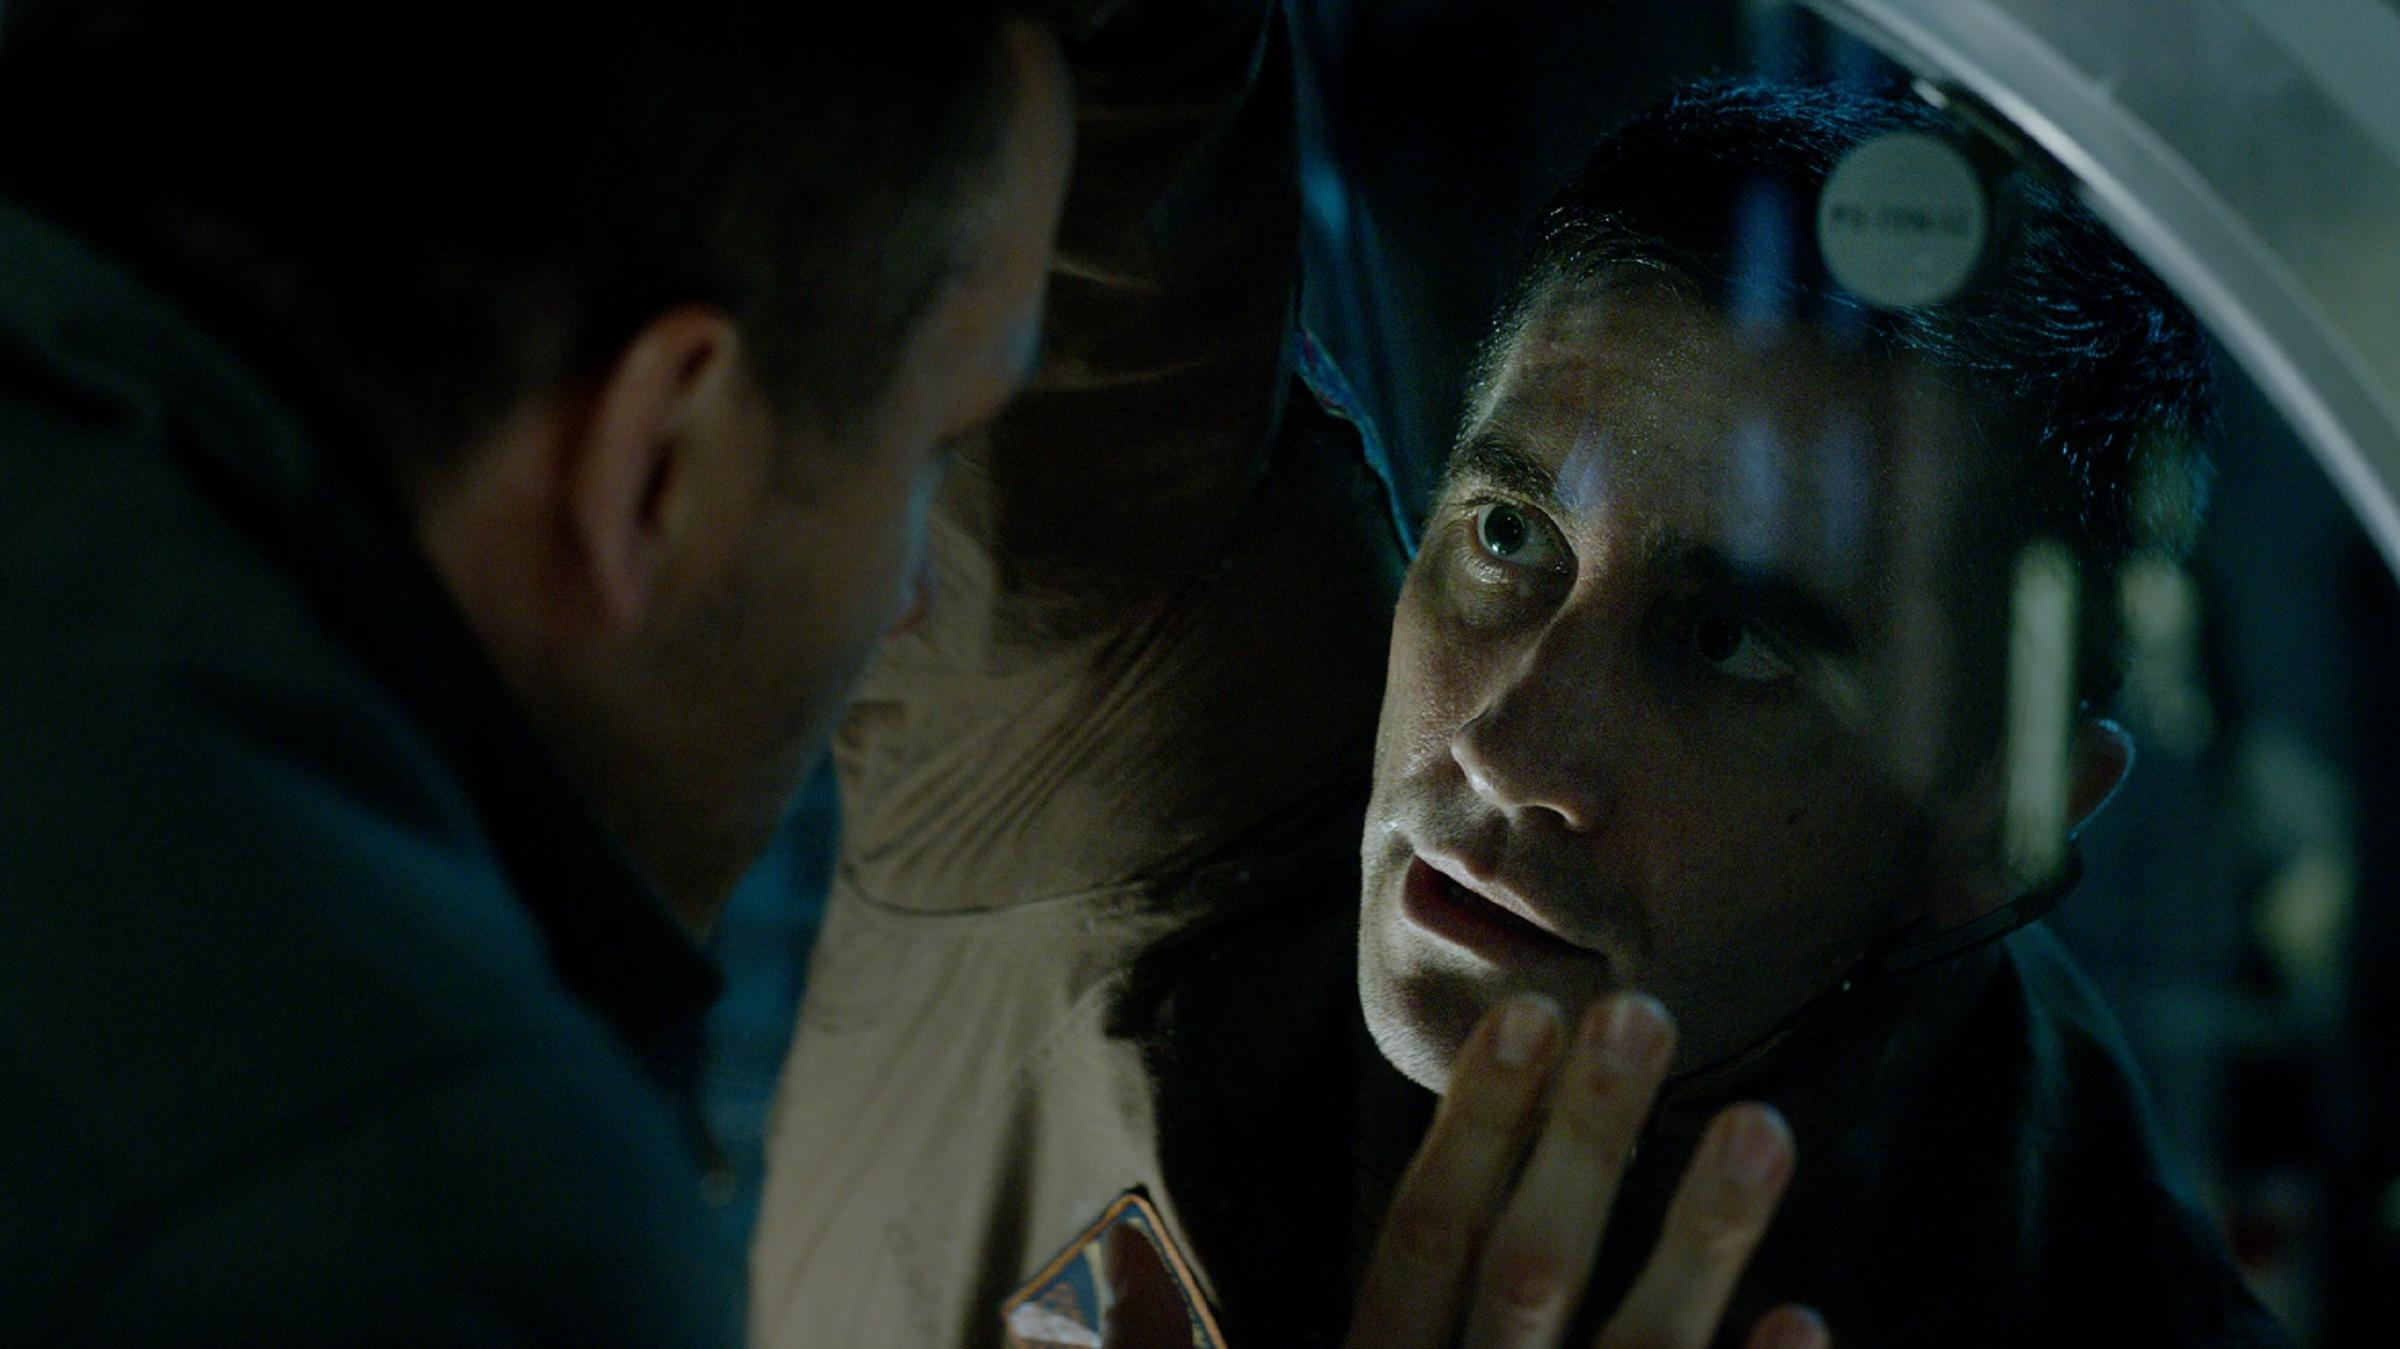 Jake Gyllenhaal was 'fake friends' with Ryan Reynolds before Life